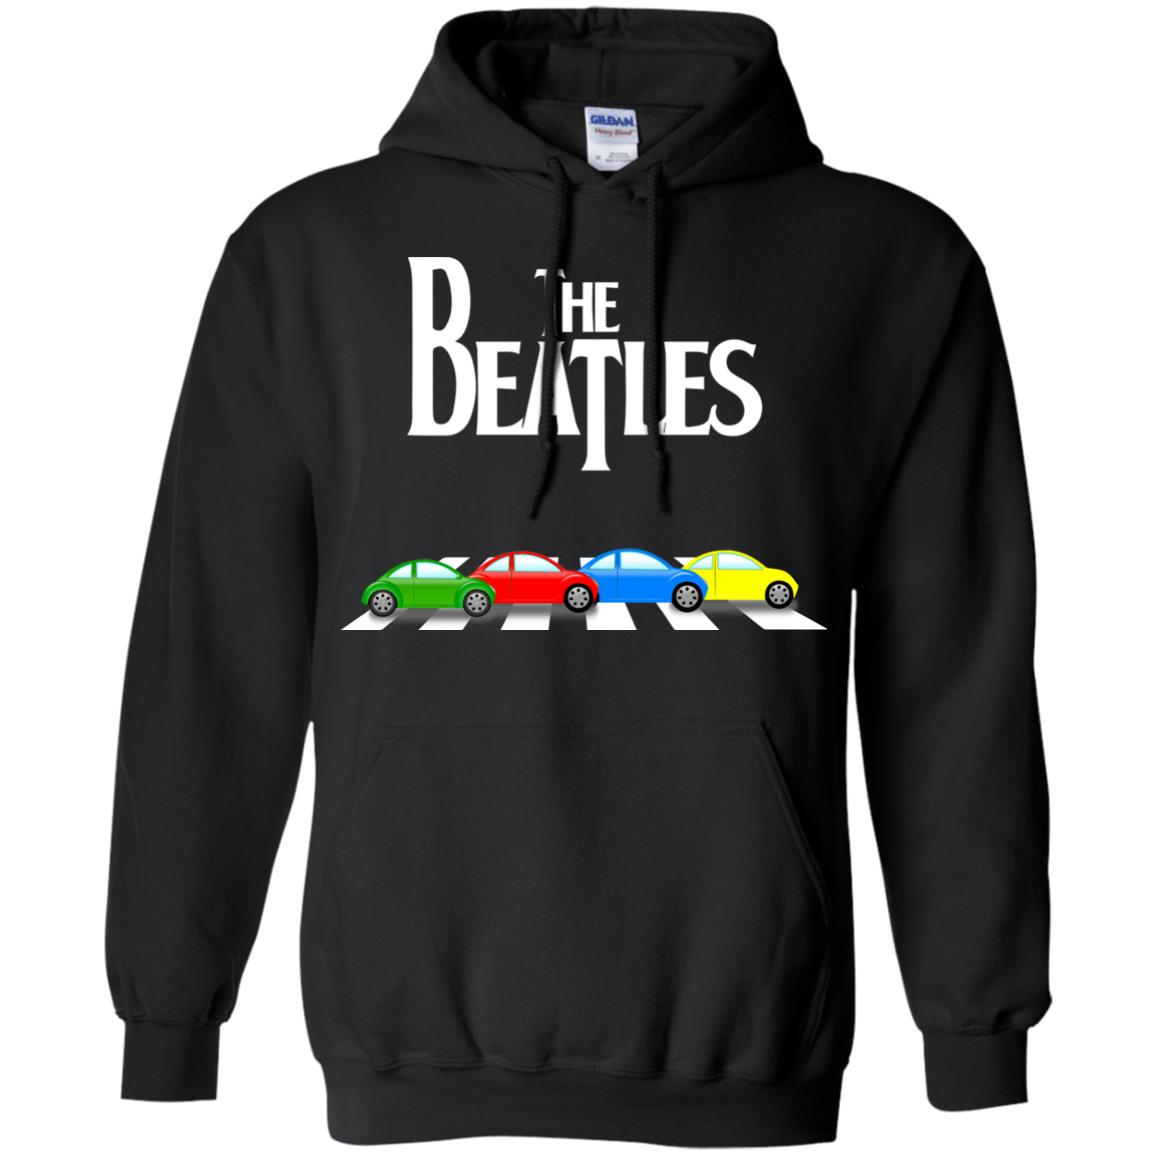 image 330 - The Beatles cars shirt, hoodie, tank